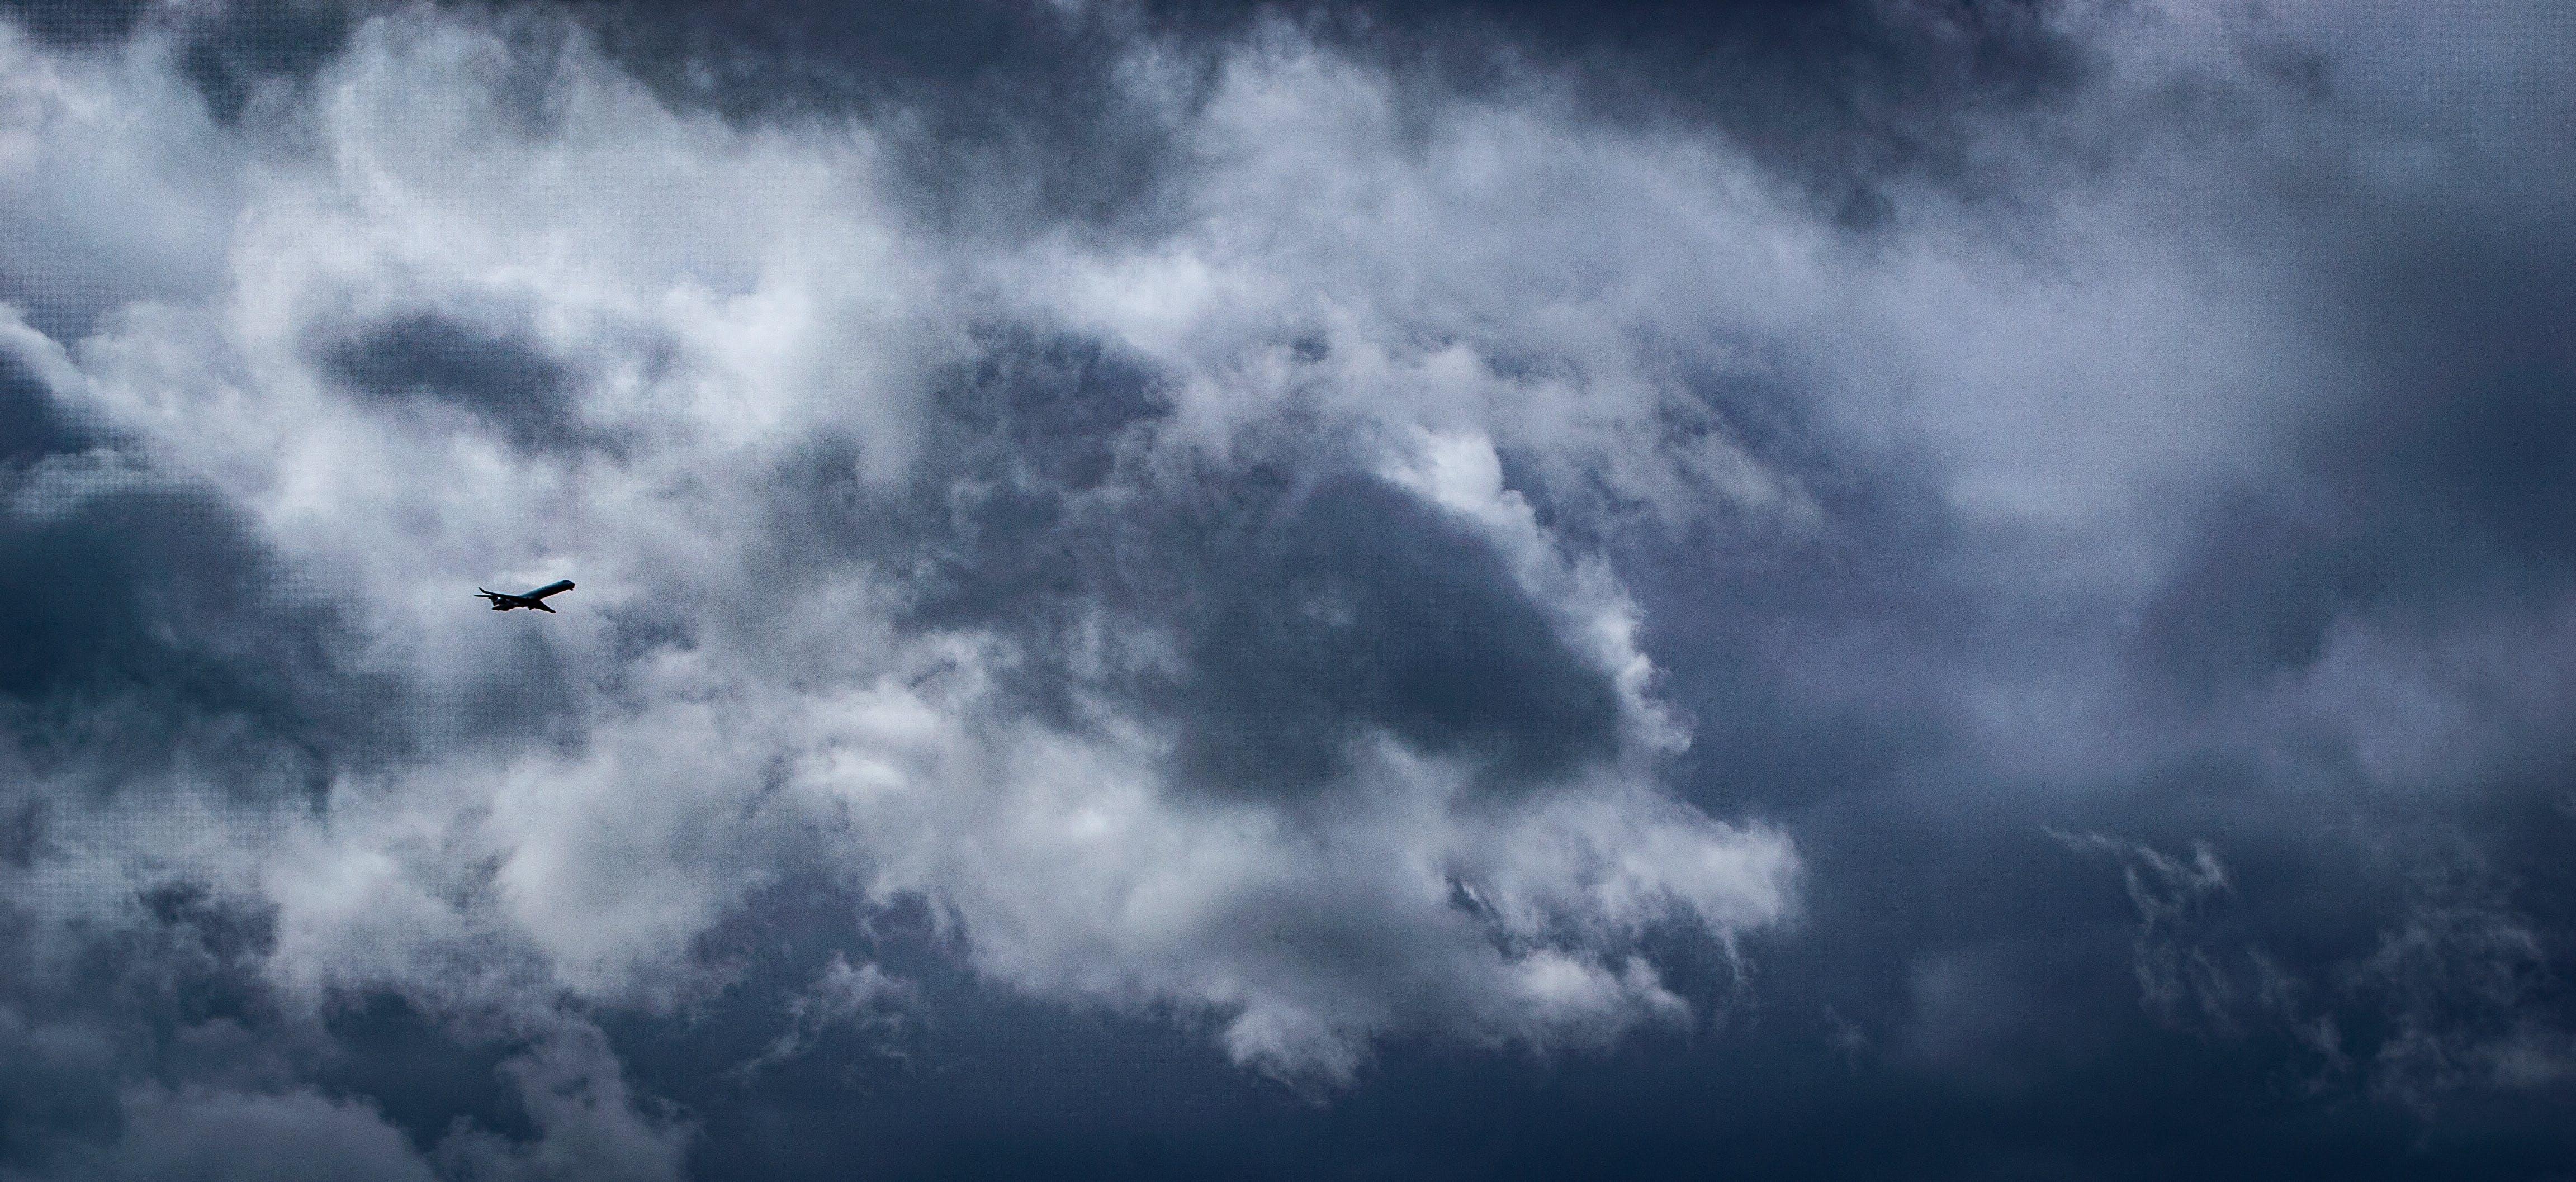 Photograph of Cloudy Sky